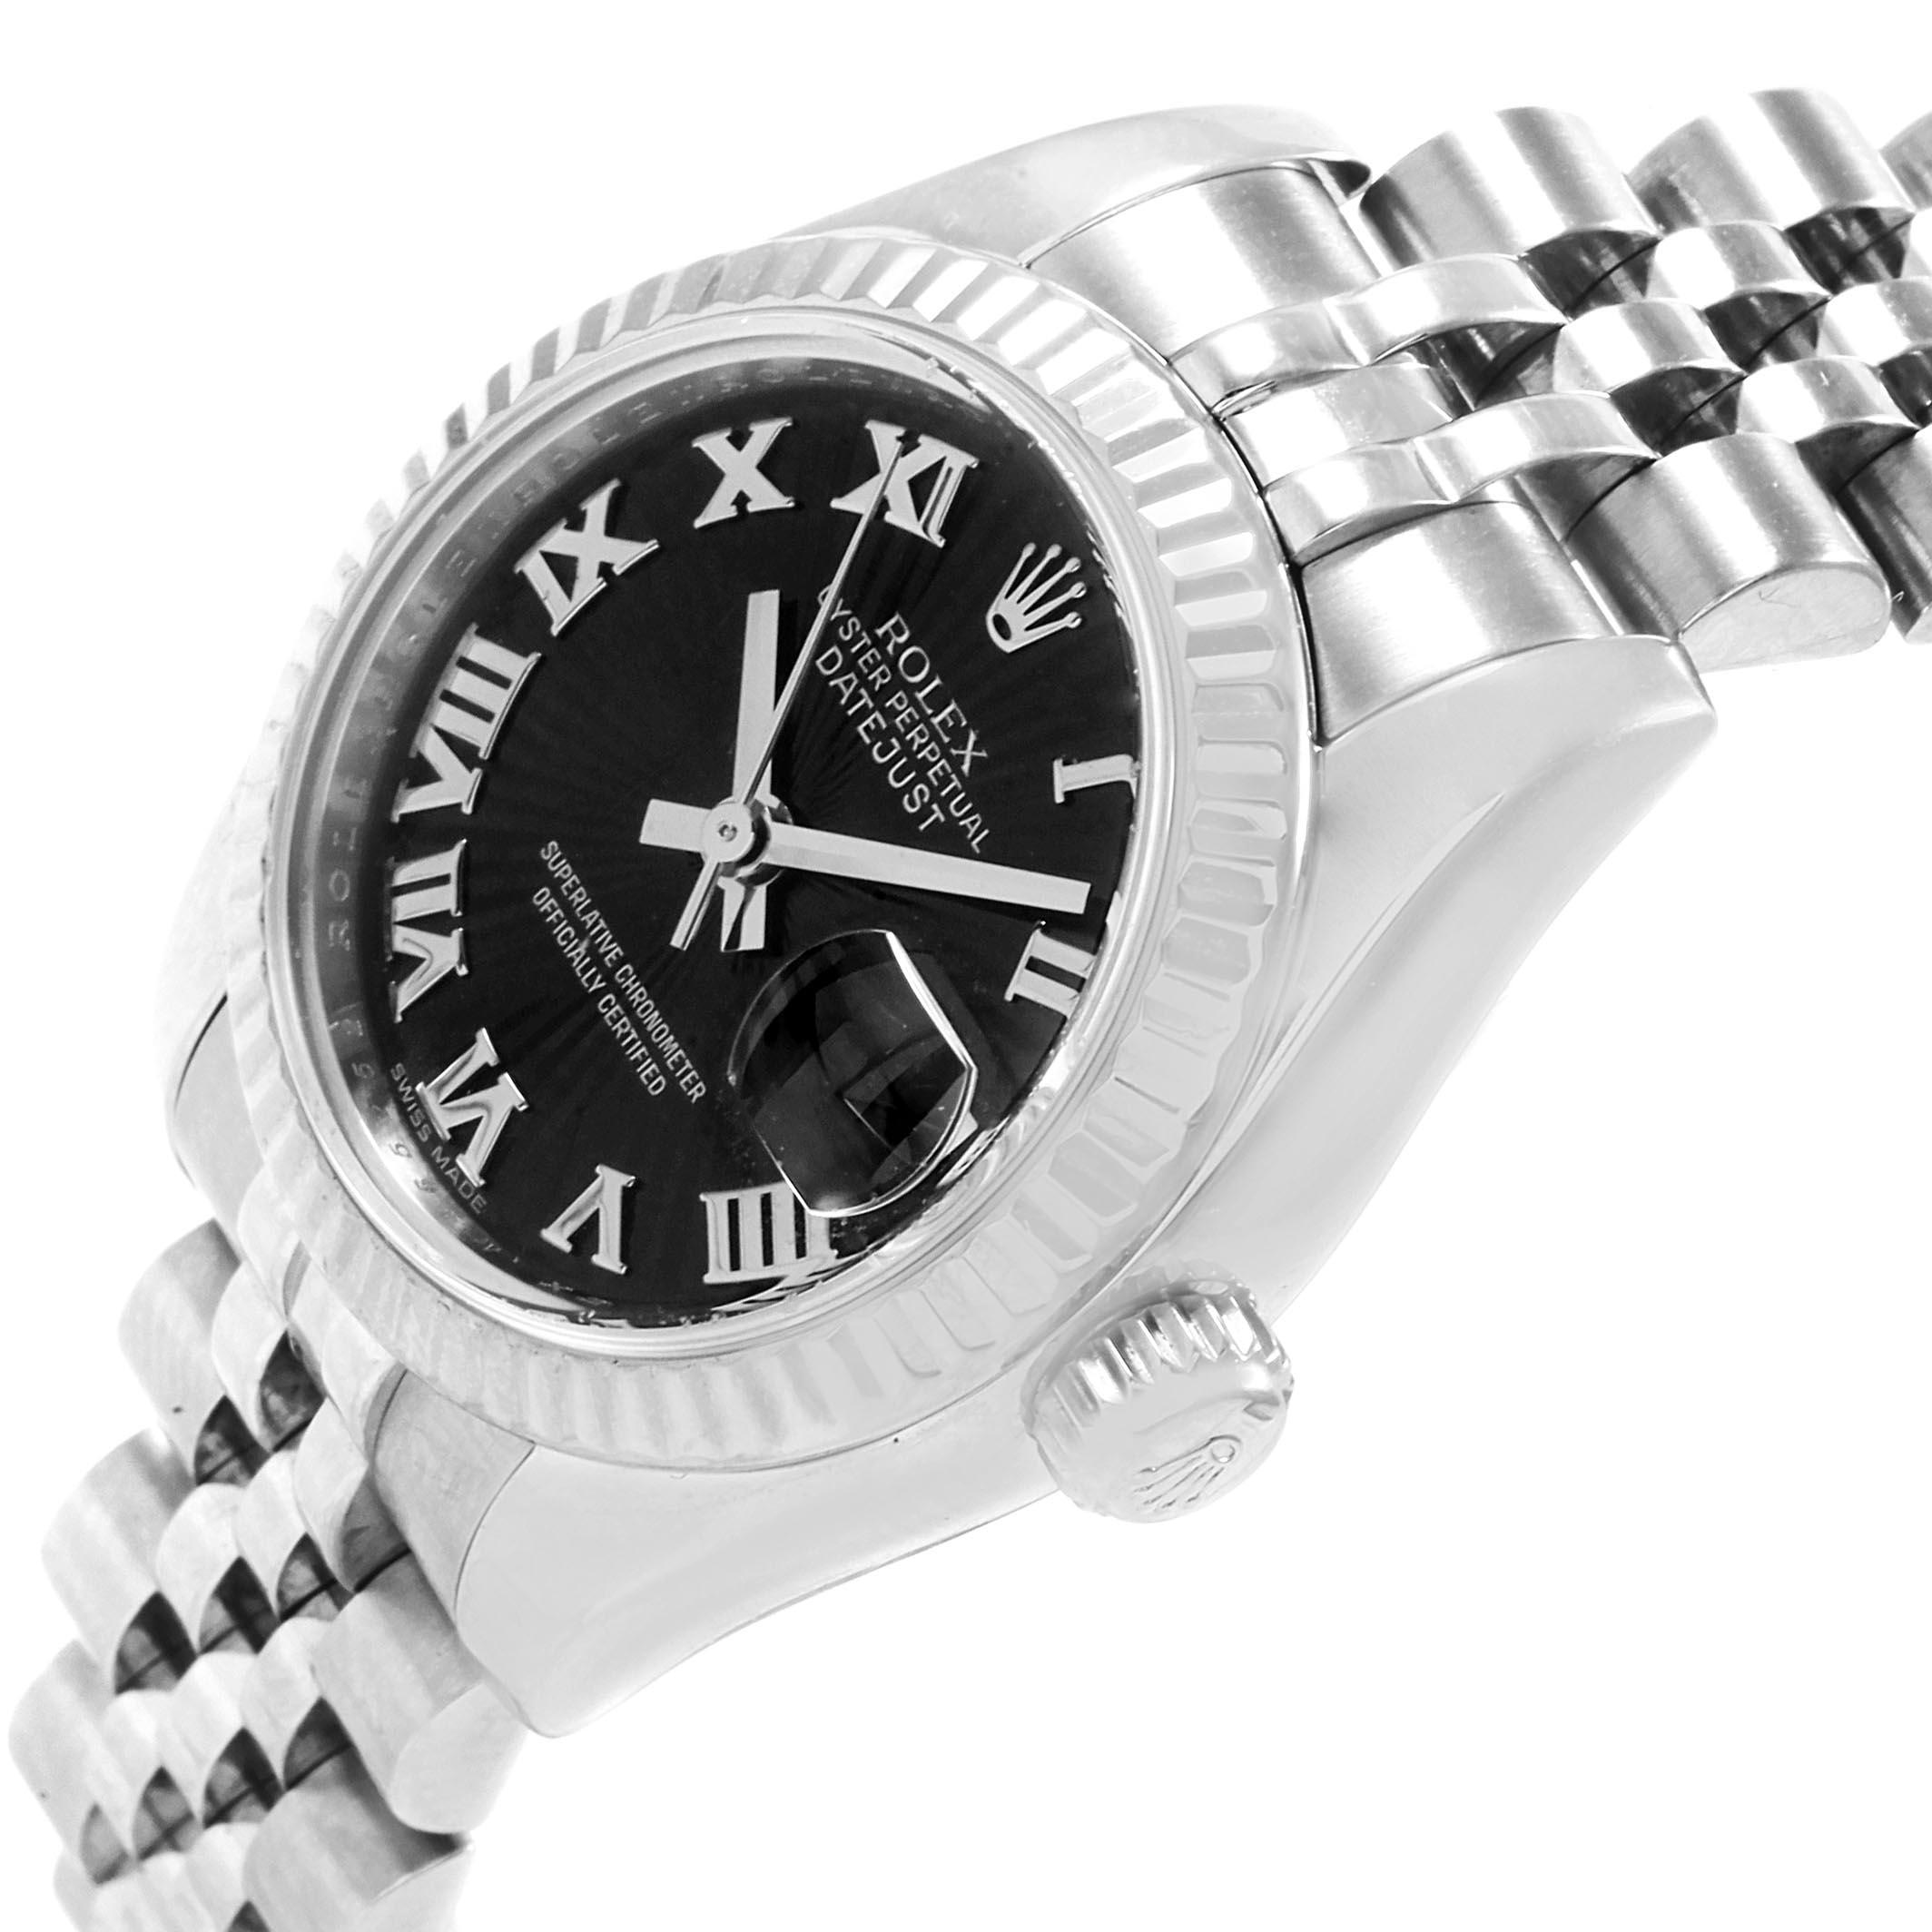 Rolex Datejust Steel White Gold Black Sunbeam Dial Ladies Watch 179174 SwissWatchExpo